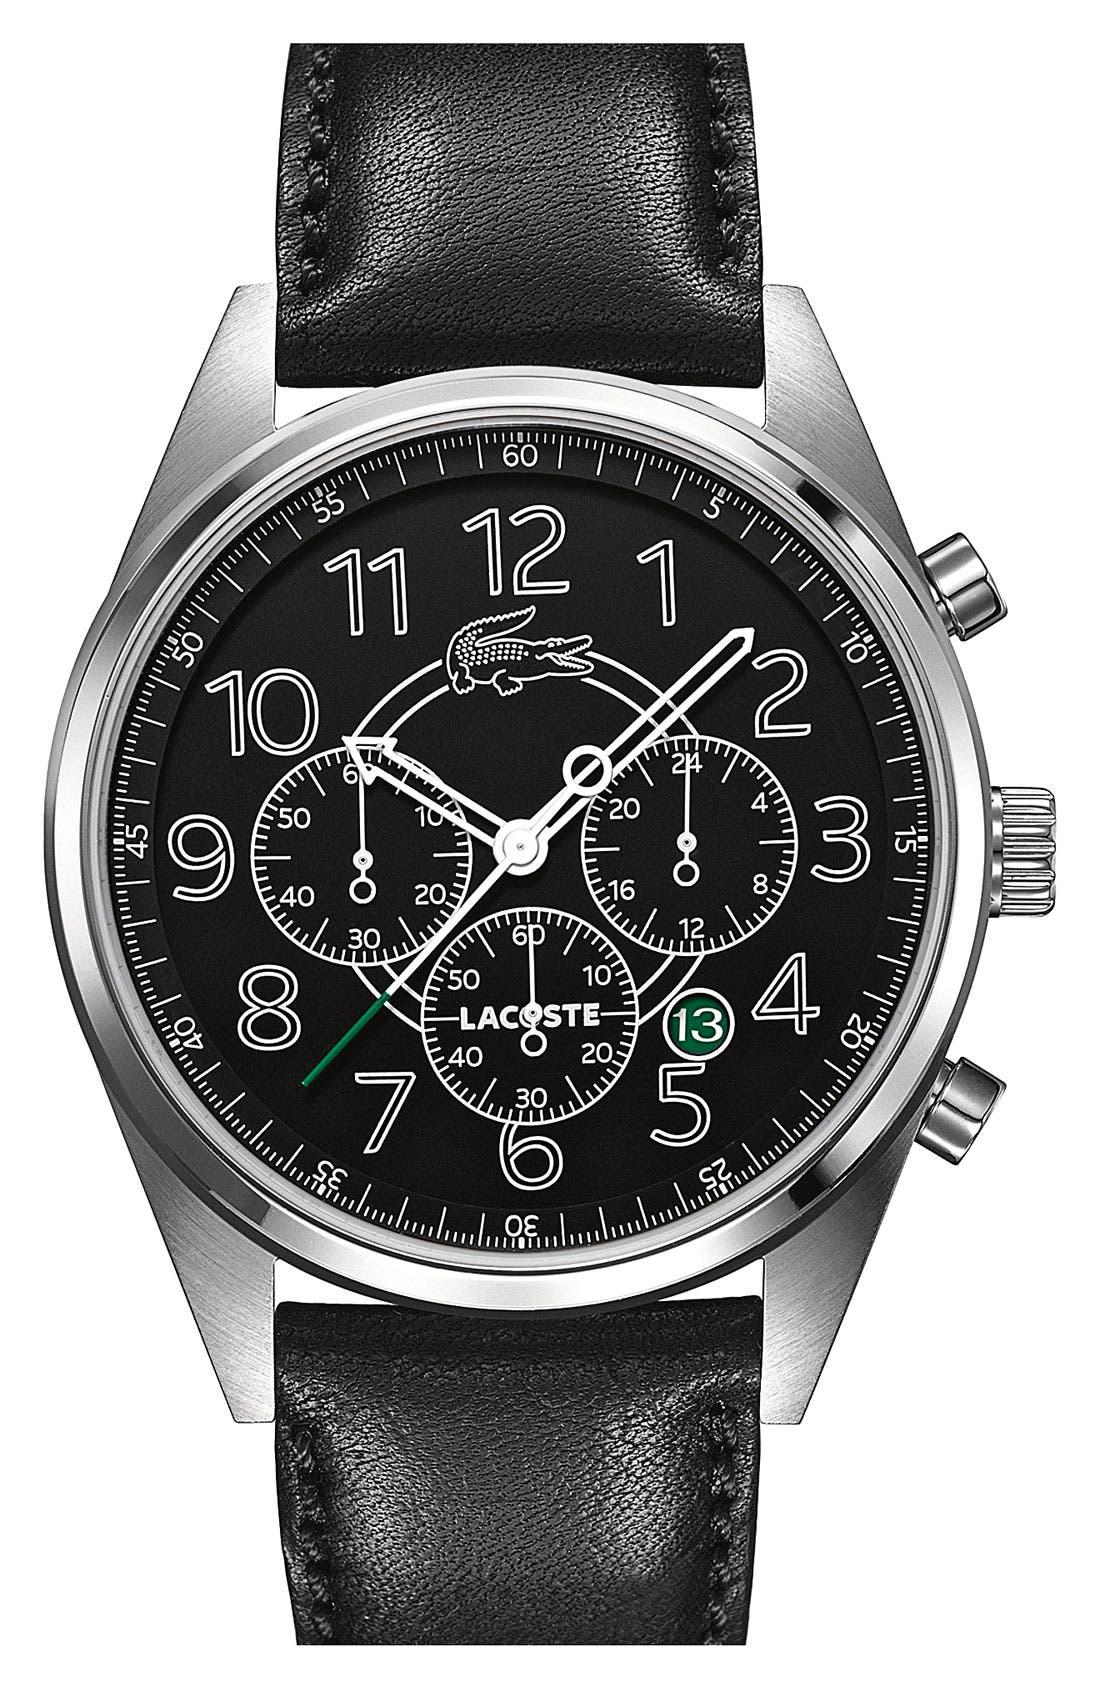 Main Image - Lacoste 'Zaragoza' Chronograph Leather Strap Watch